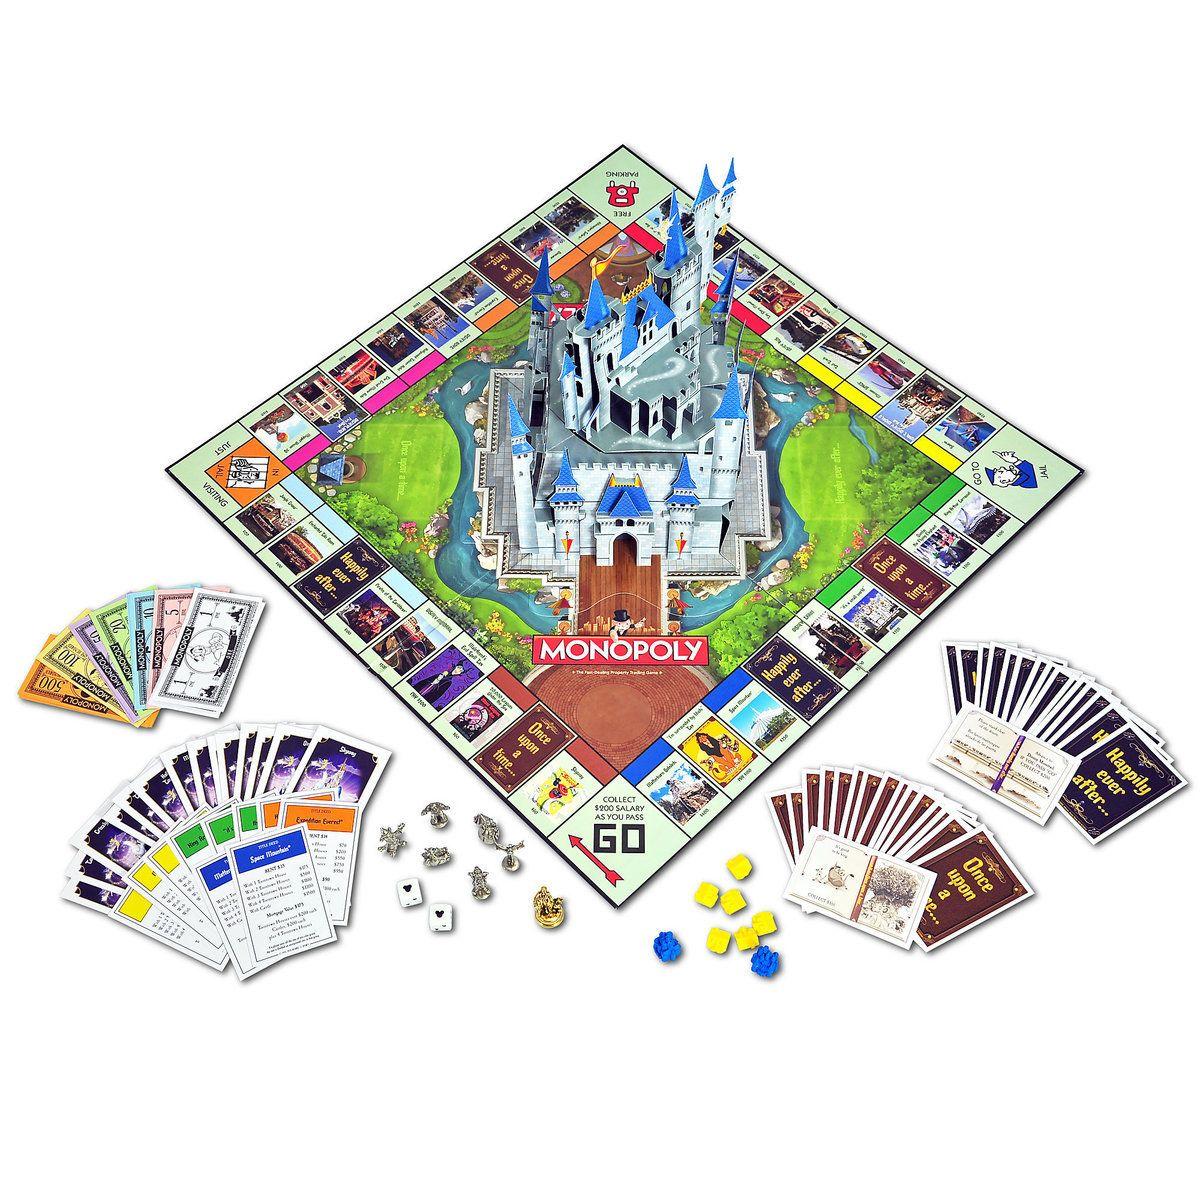 Product Image Of Disney Theme Park Edition Iii Monopoly Game 1 Disney Theme Parks Disney Board Games Disney Games